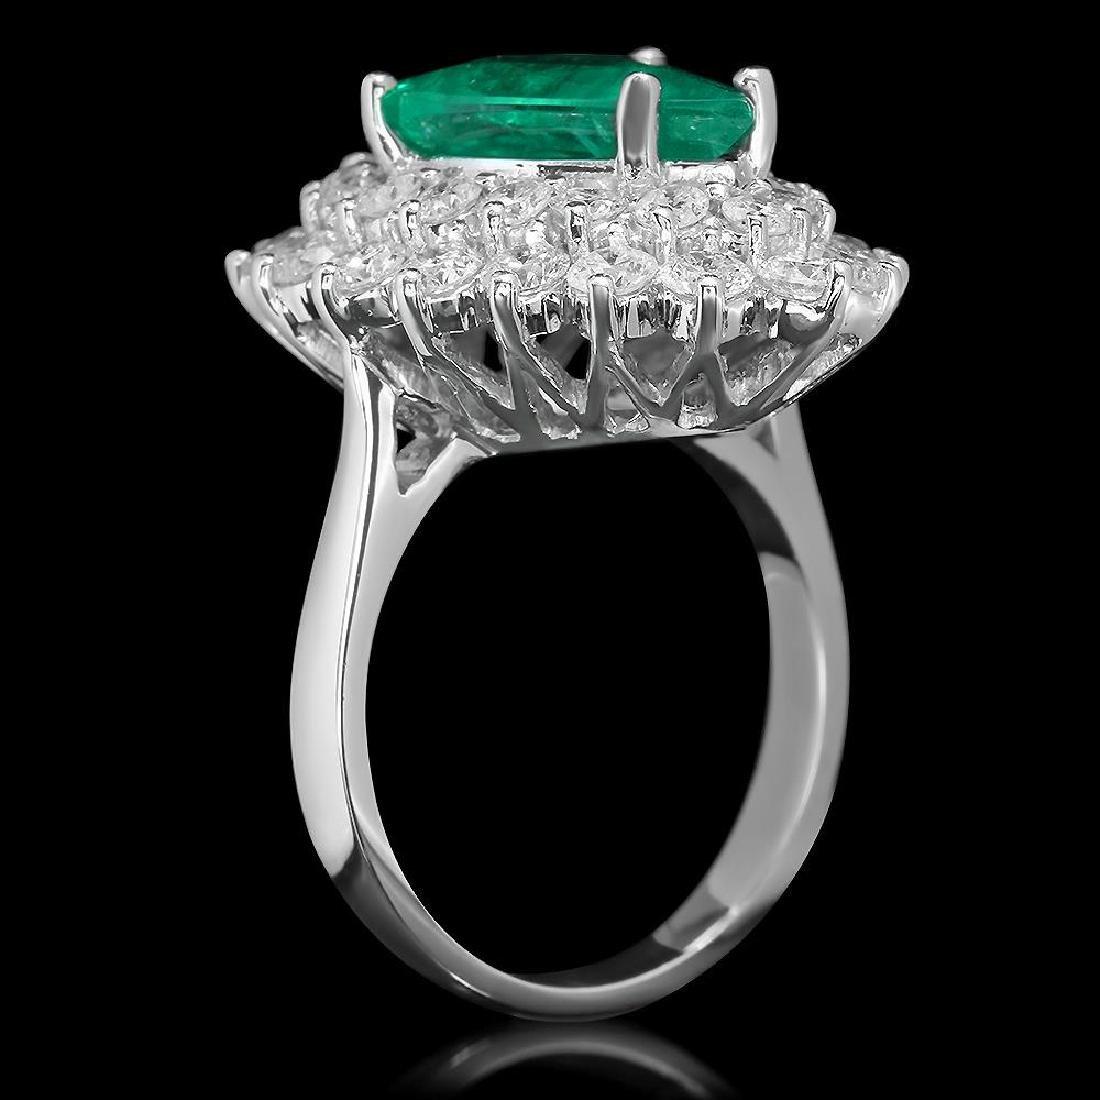 14K Gold 4.89 Emerald 2.65 Diamond Ring - 2